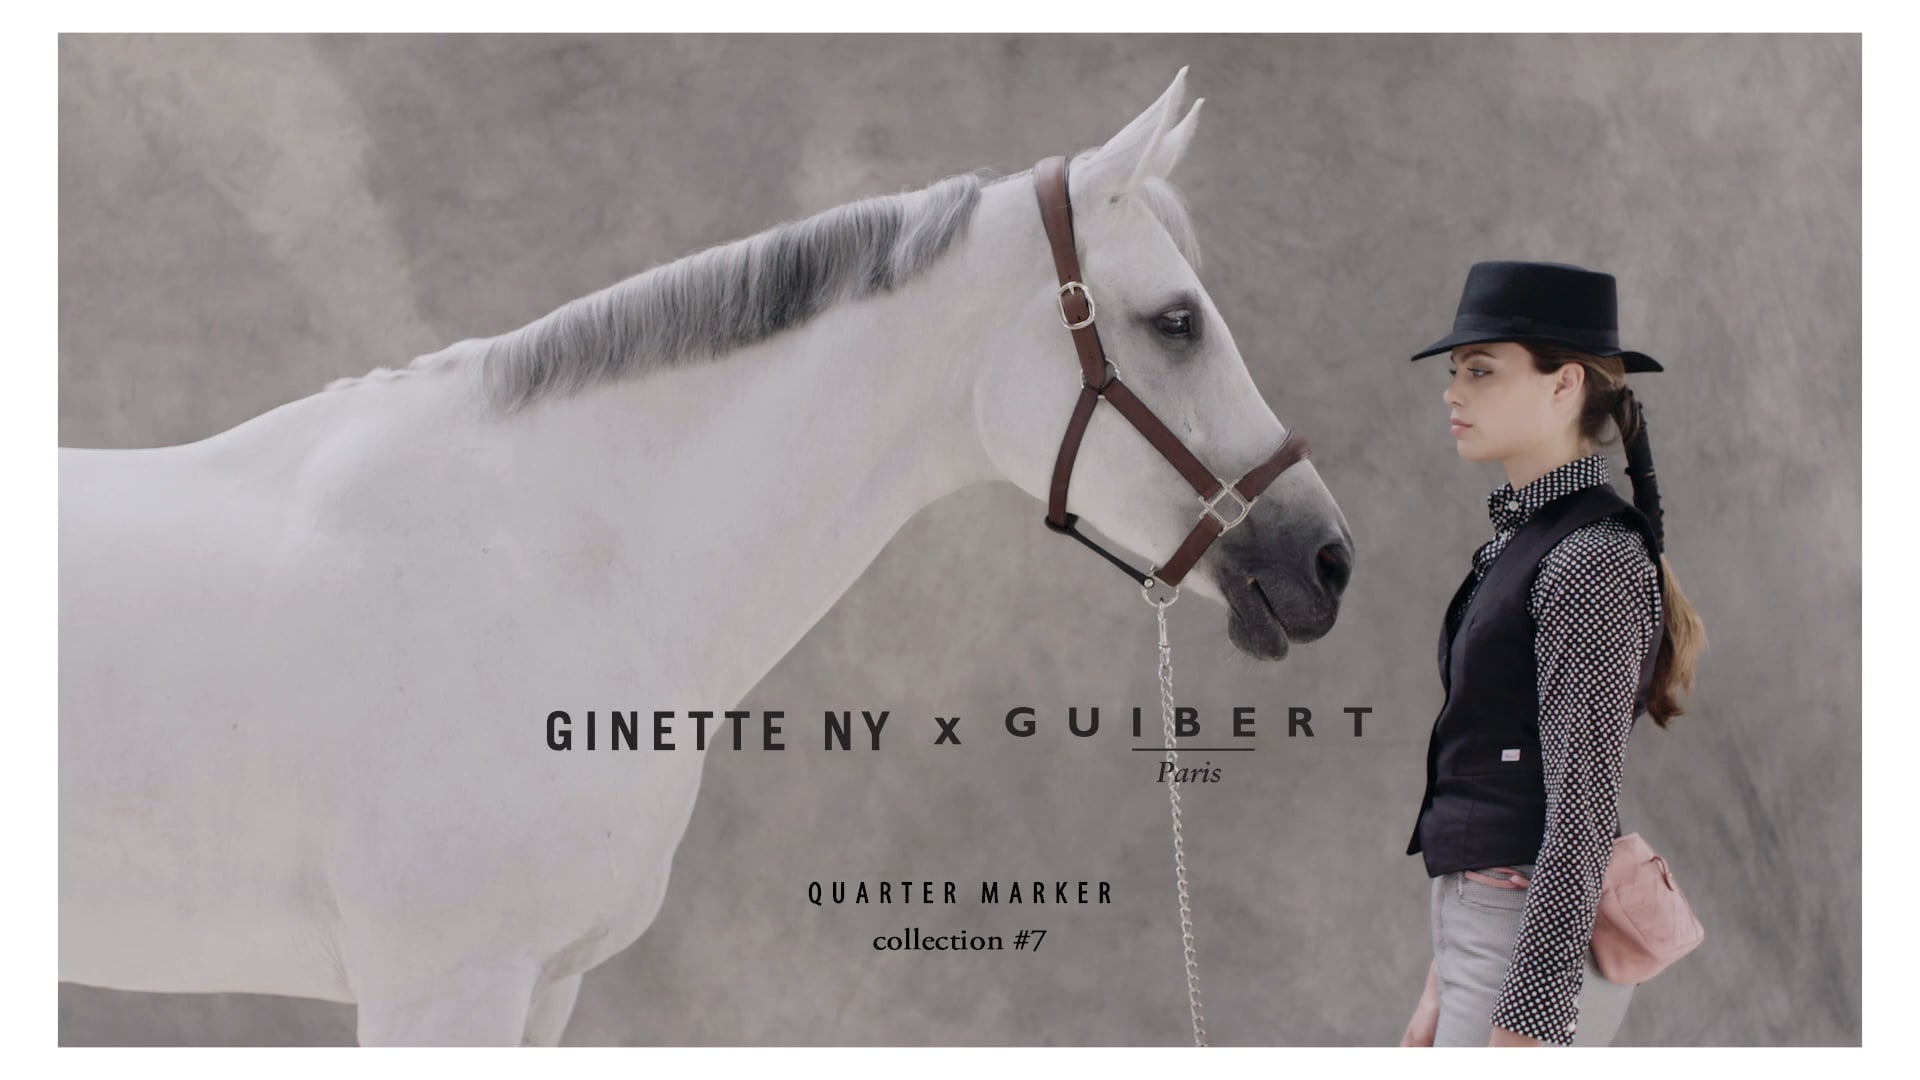 Ginette NY x Guibert Paris Instamovie